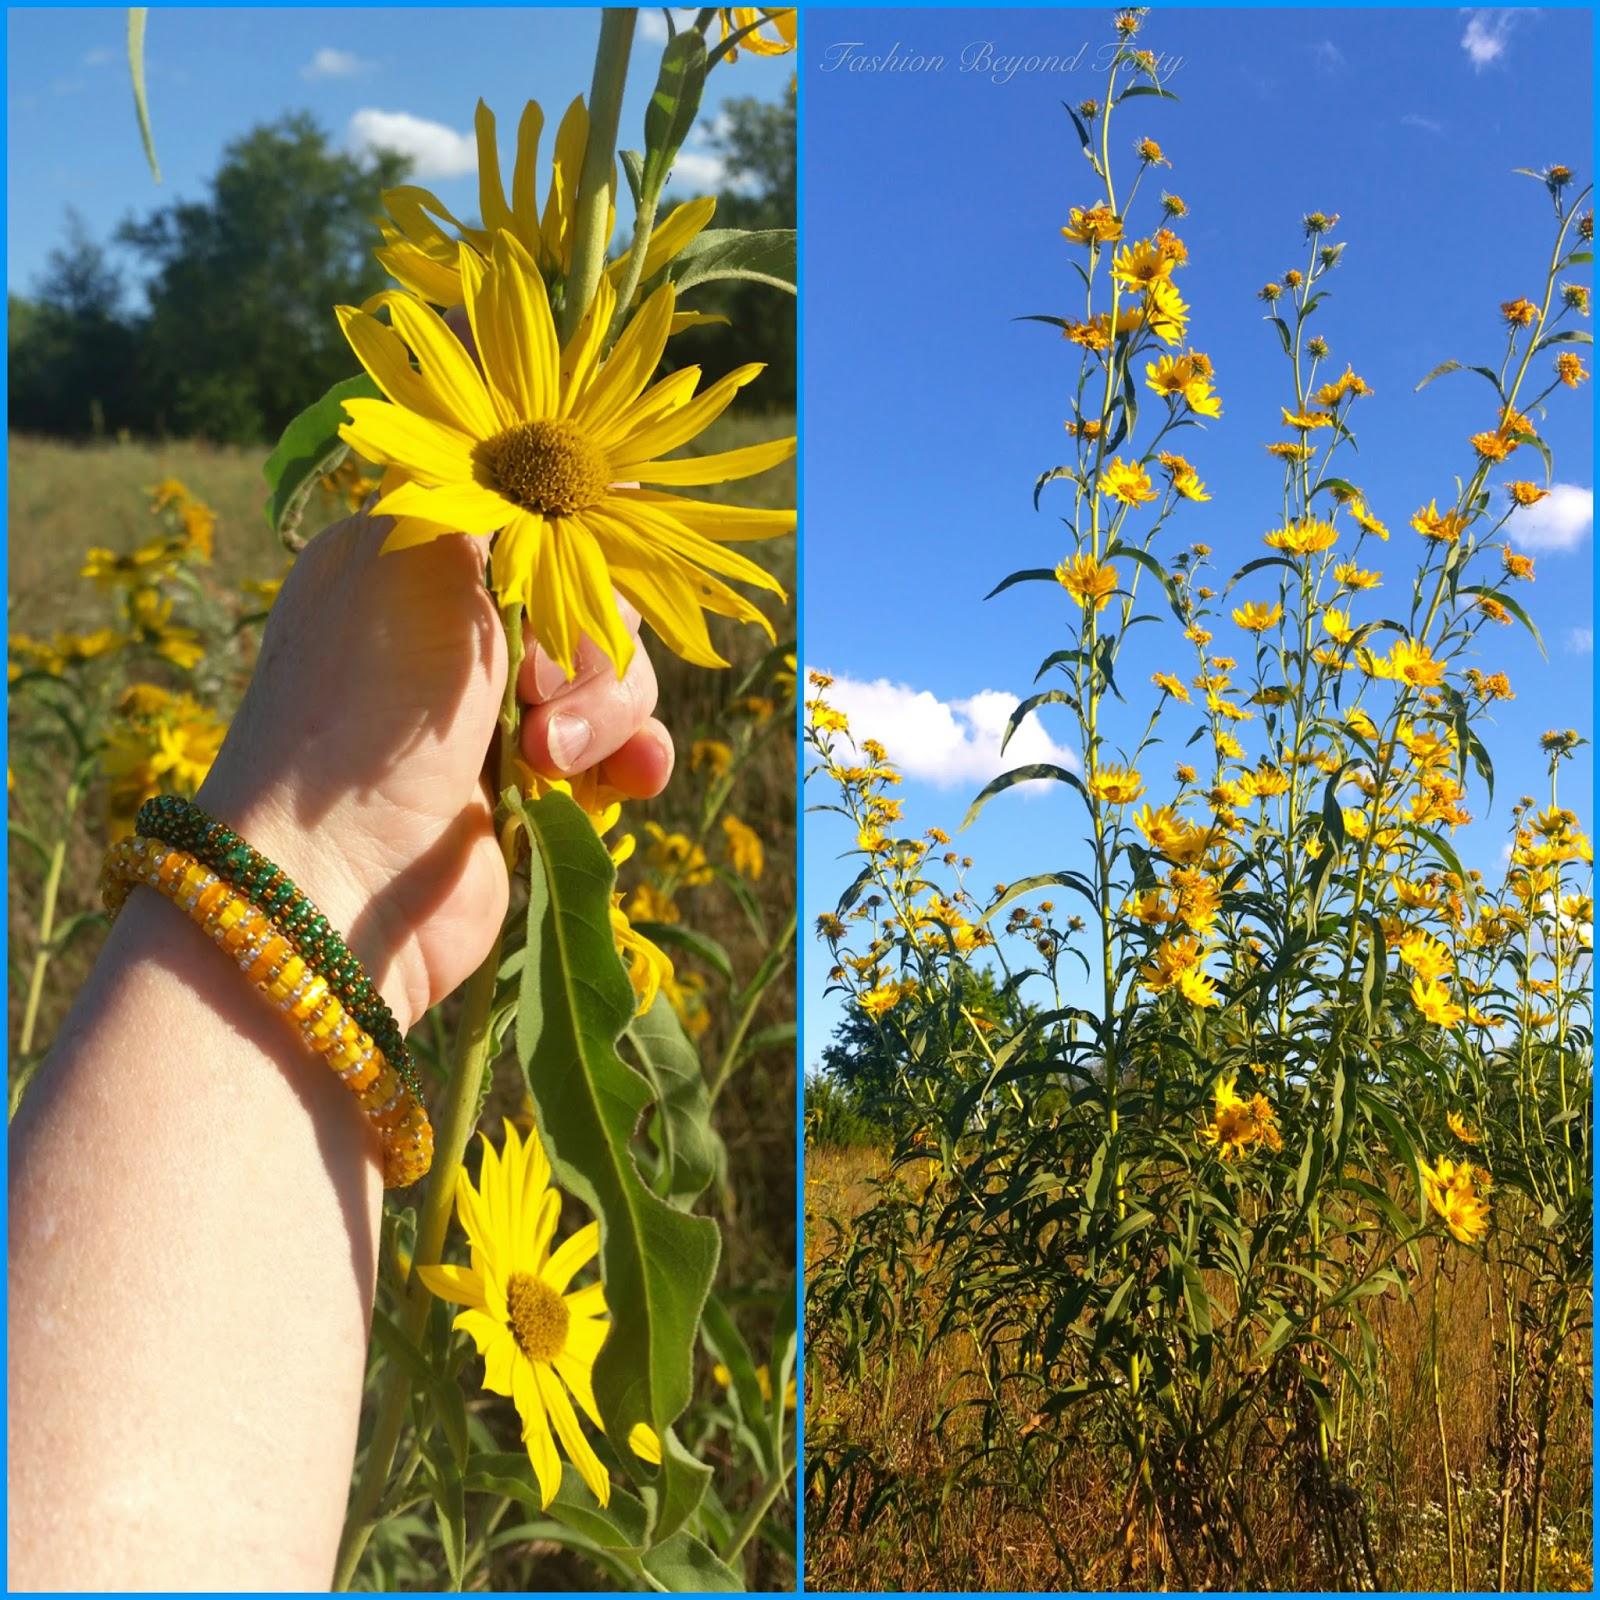 Kansas Sunflowers and SashkaCo Bracelets